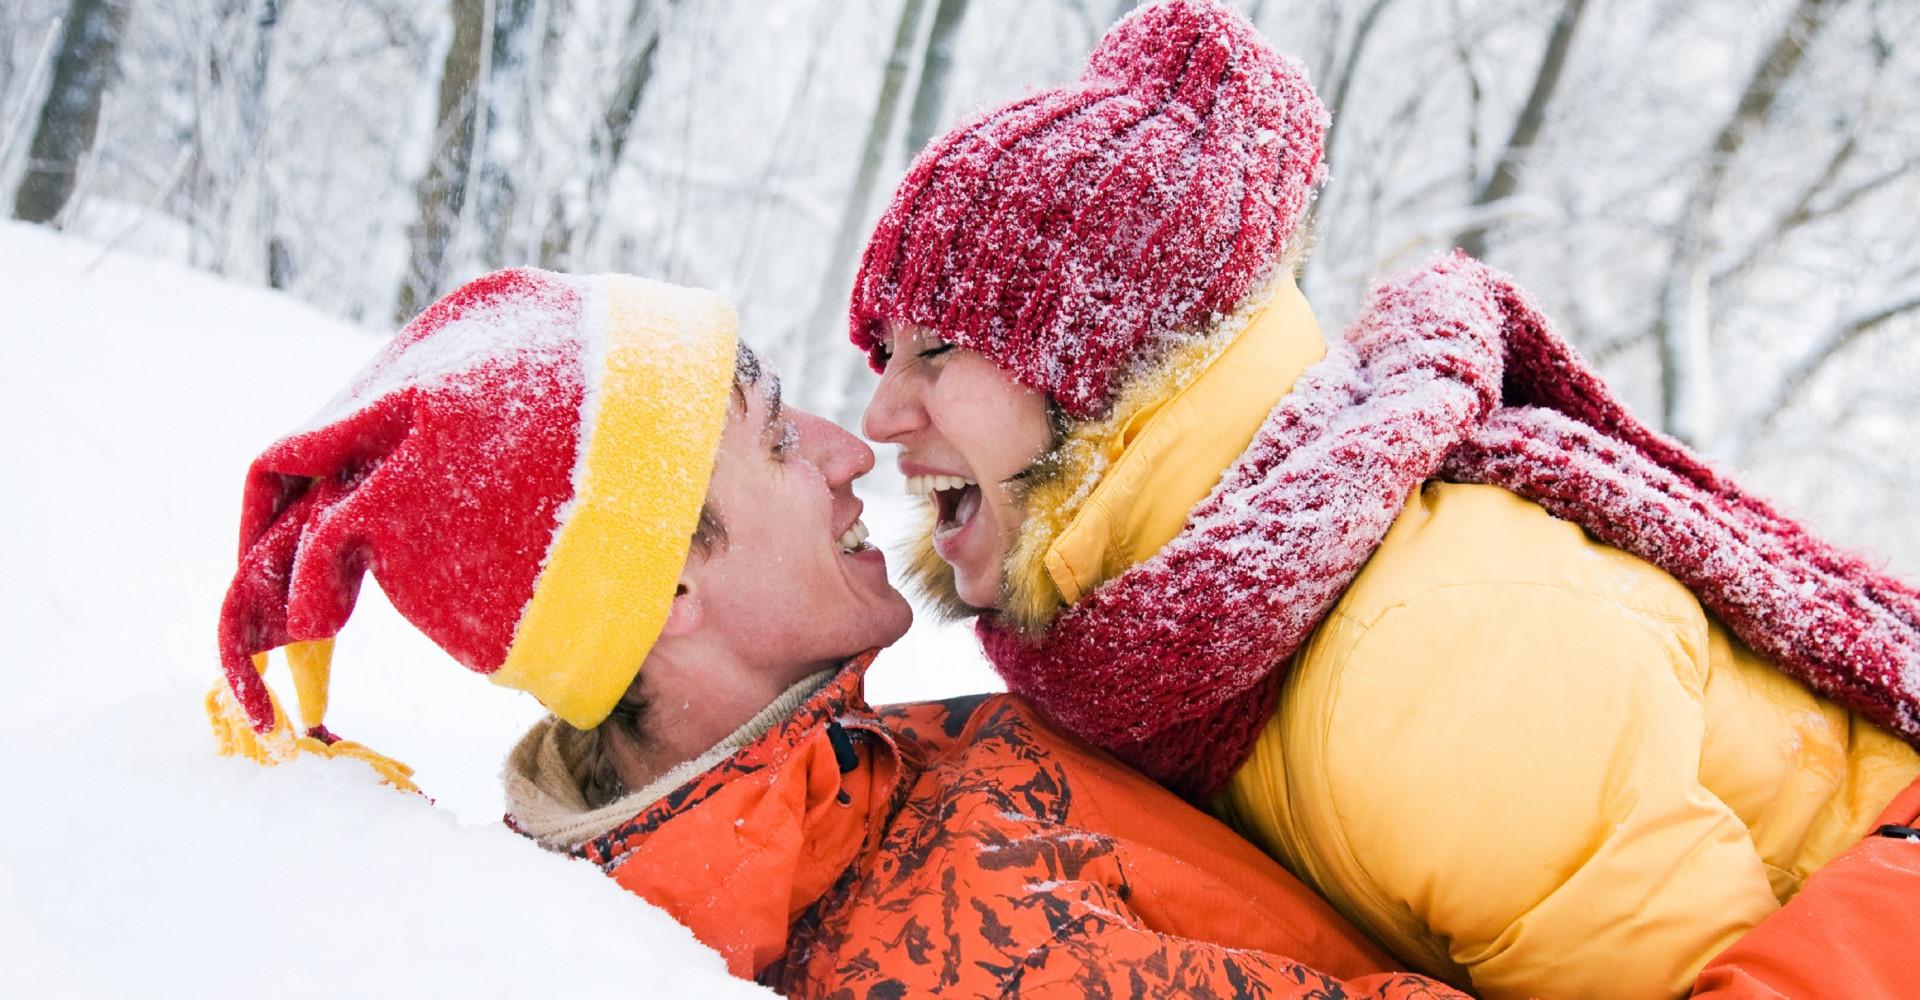 Waarom winterse seks zo goed voor je is